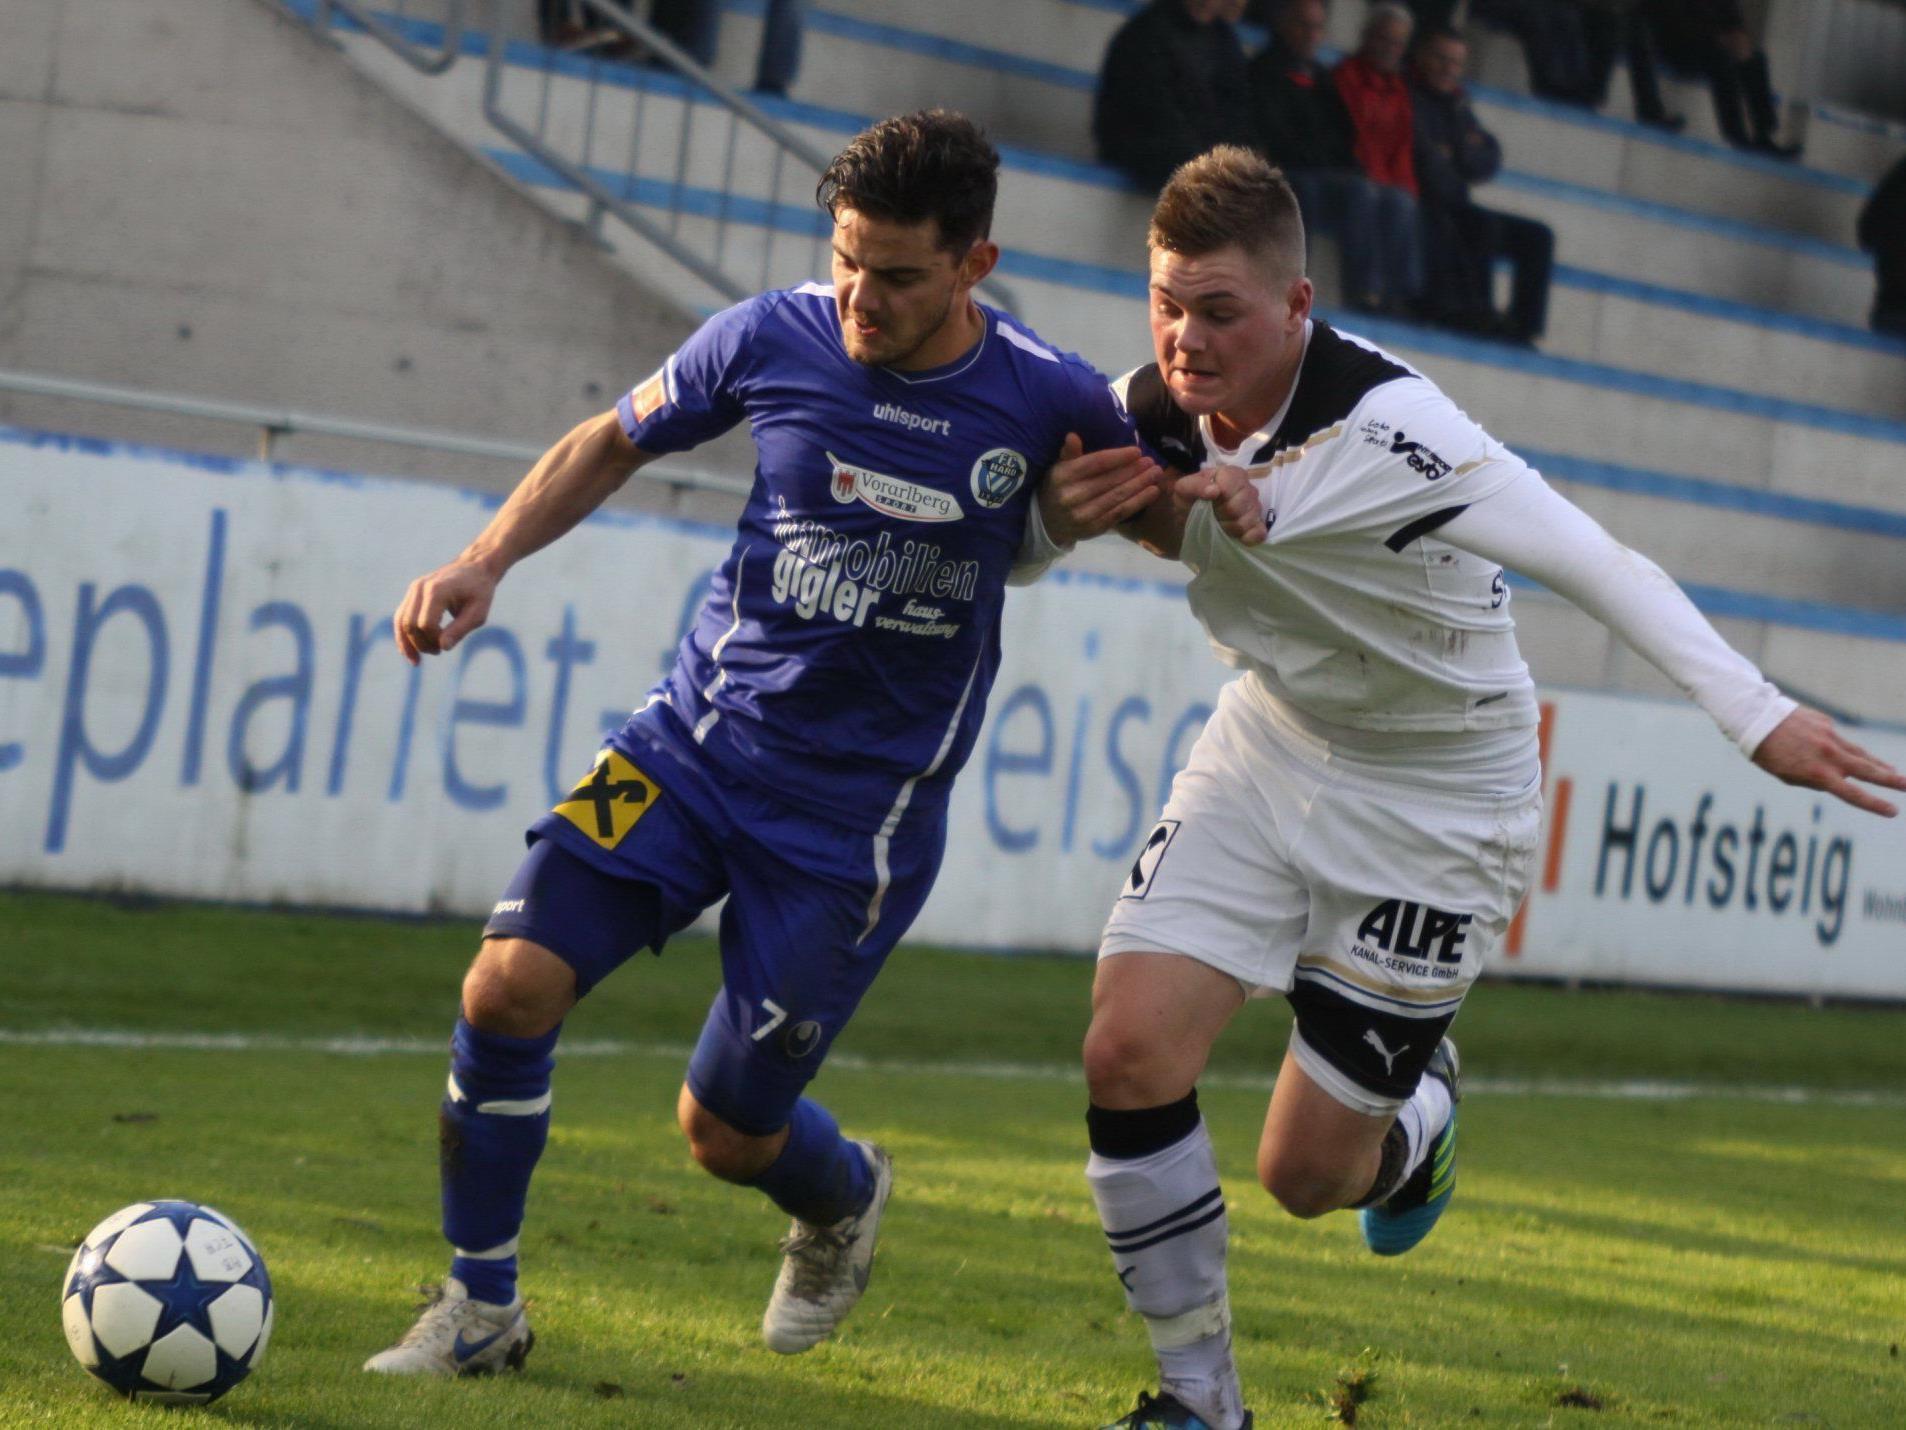 FC Hard verlor gegen Wattens mit 0:4.